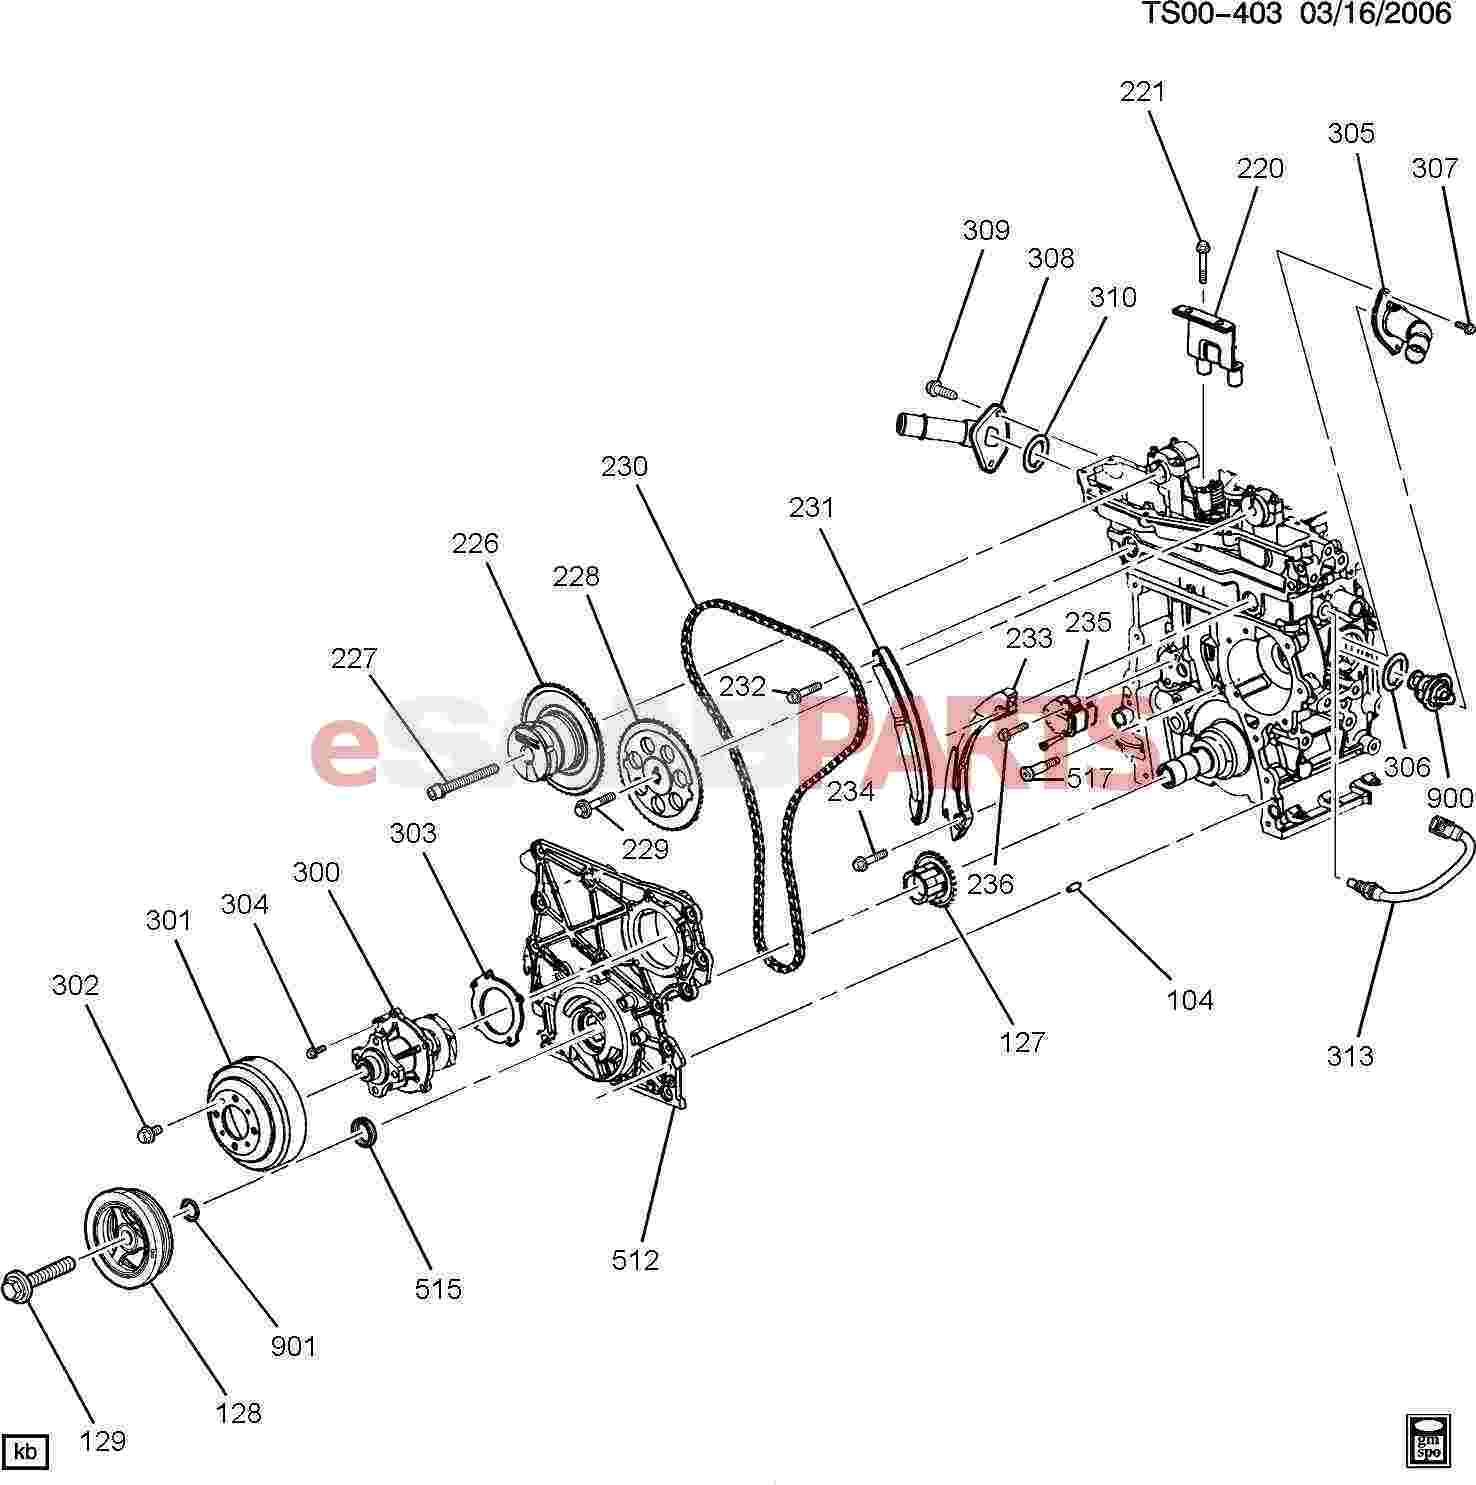 hight resolution of 2003 trailblazer 4 2 engine diagram